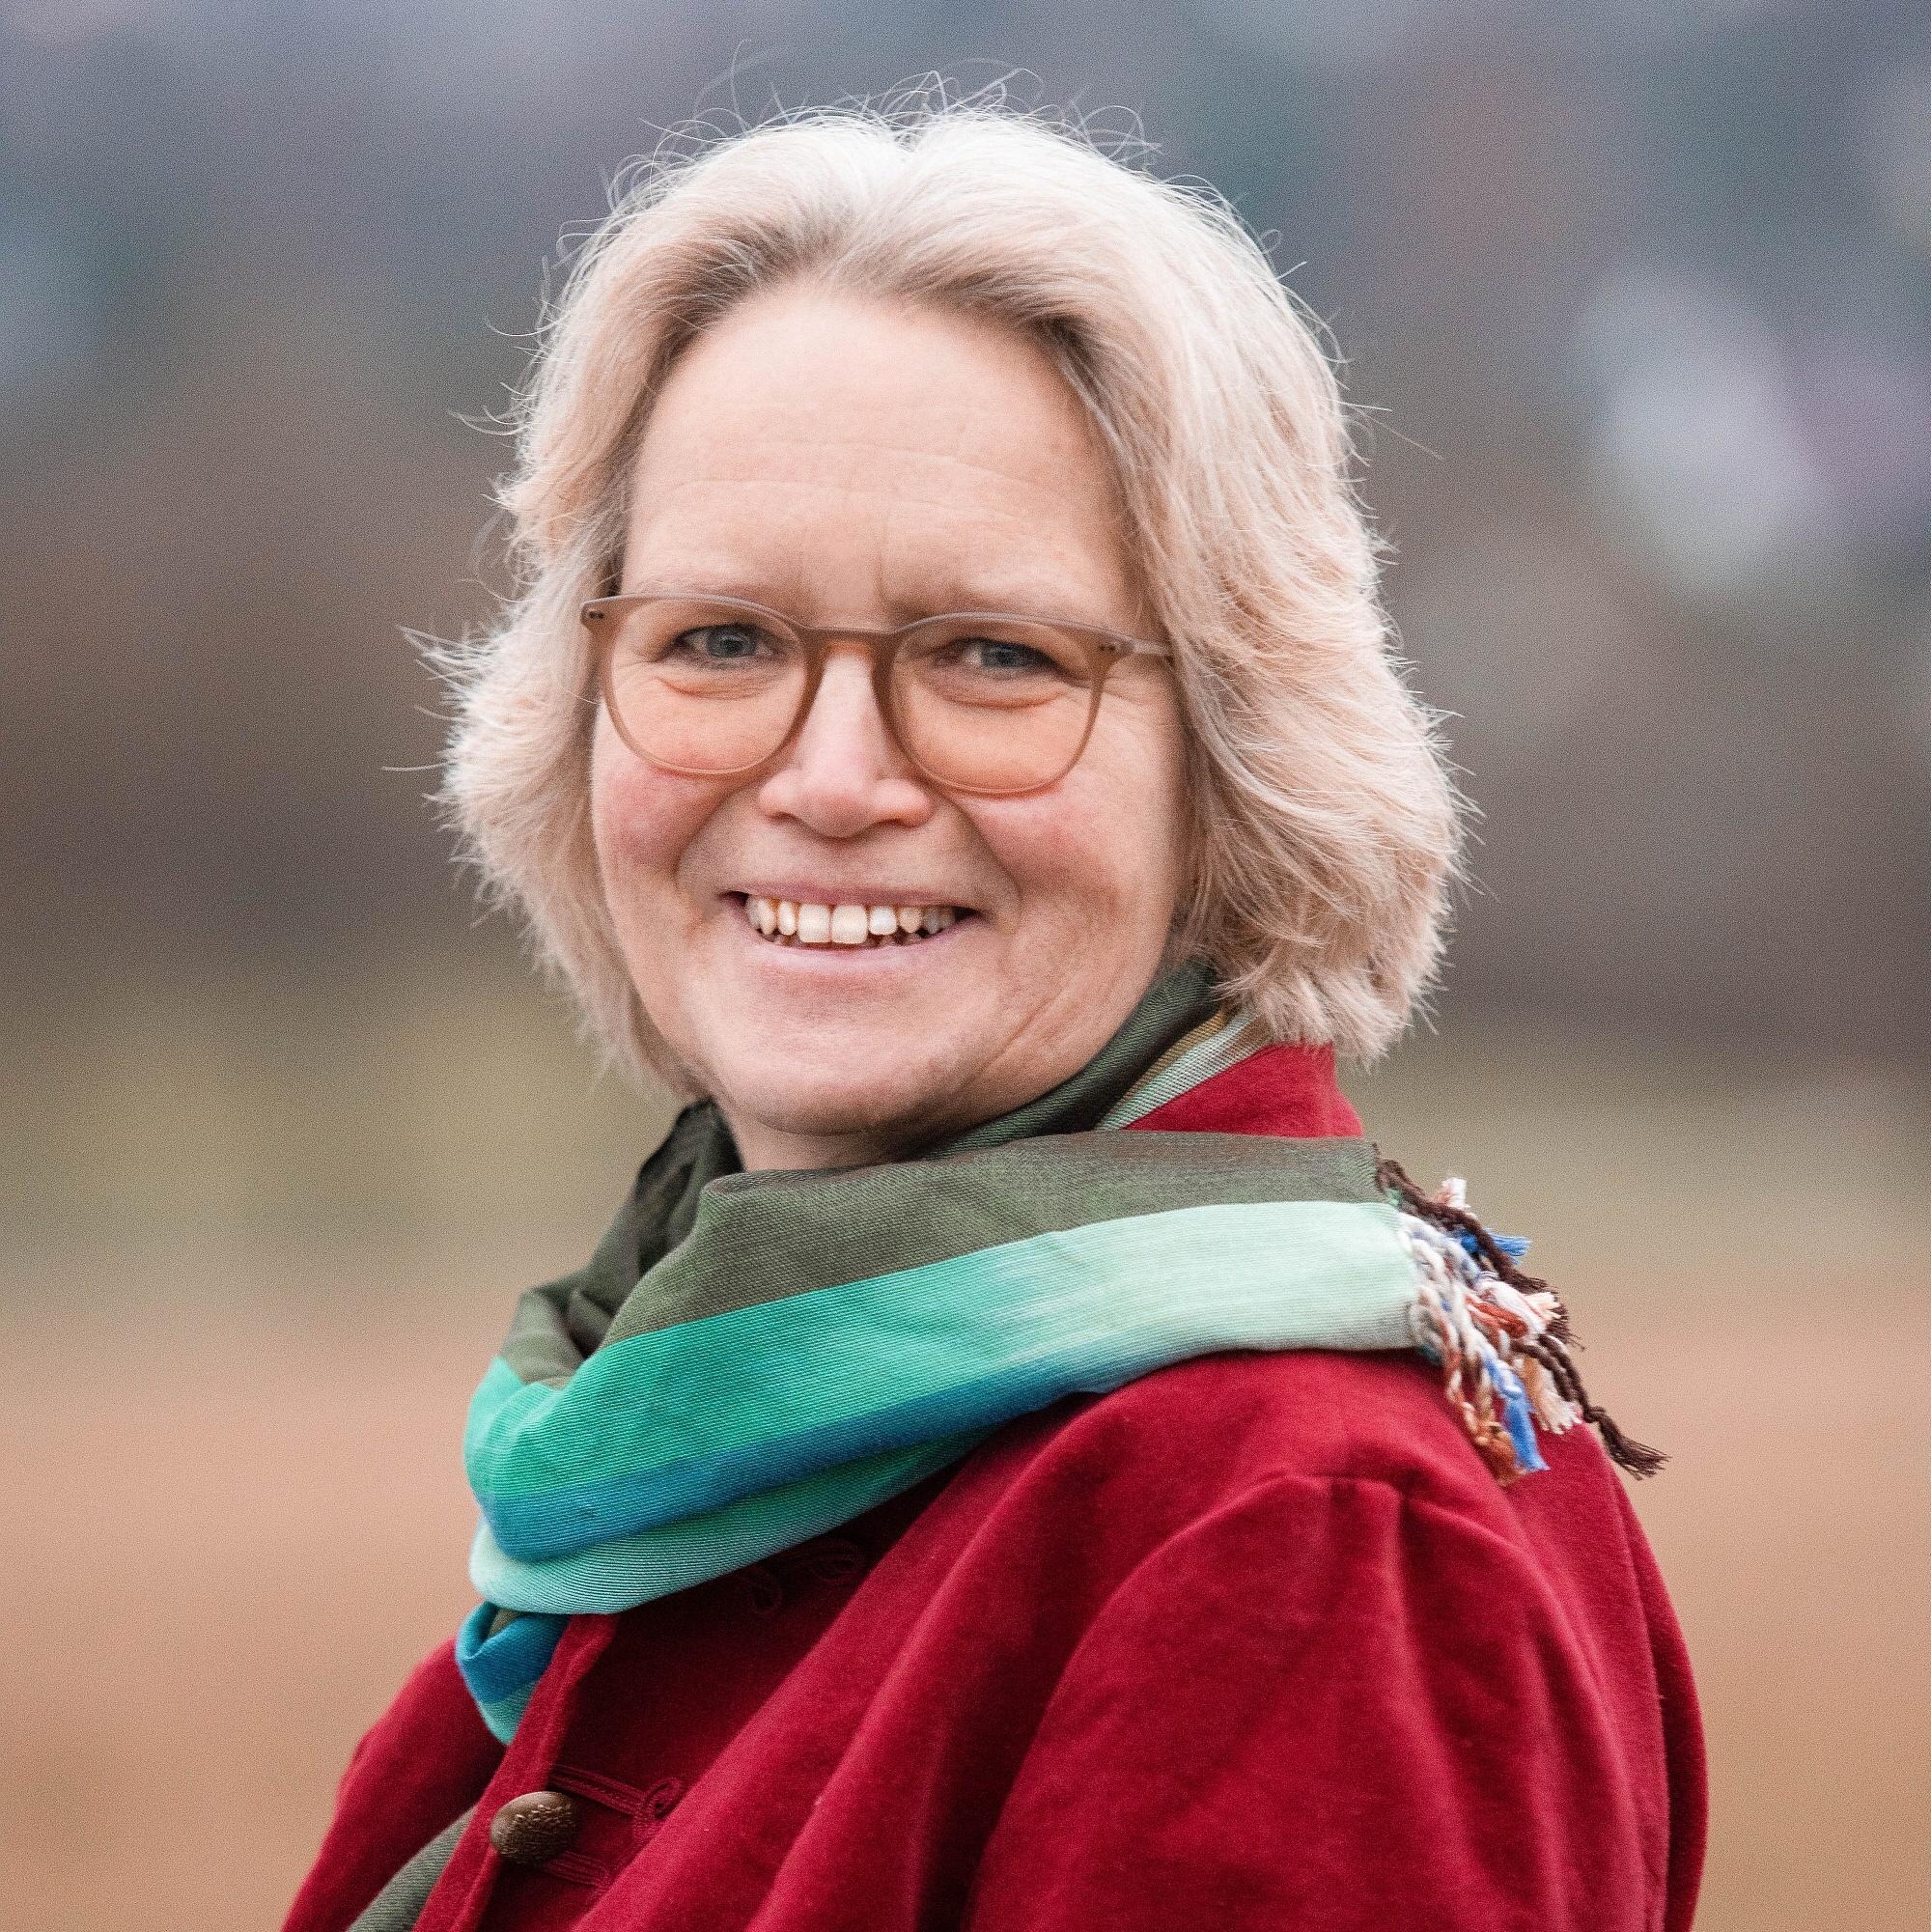 Katharina Kleine Vennekate